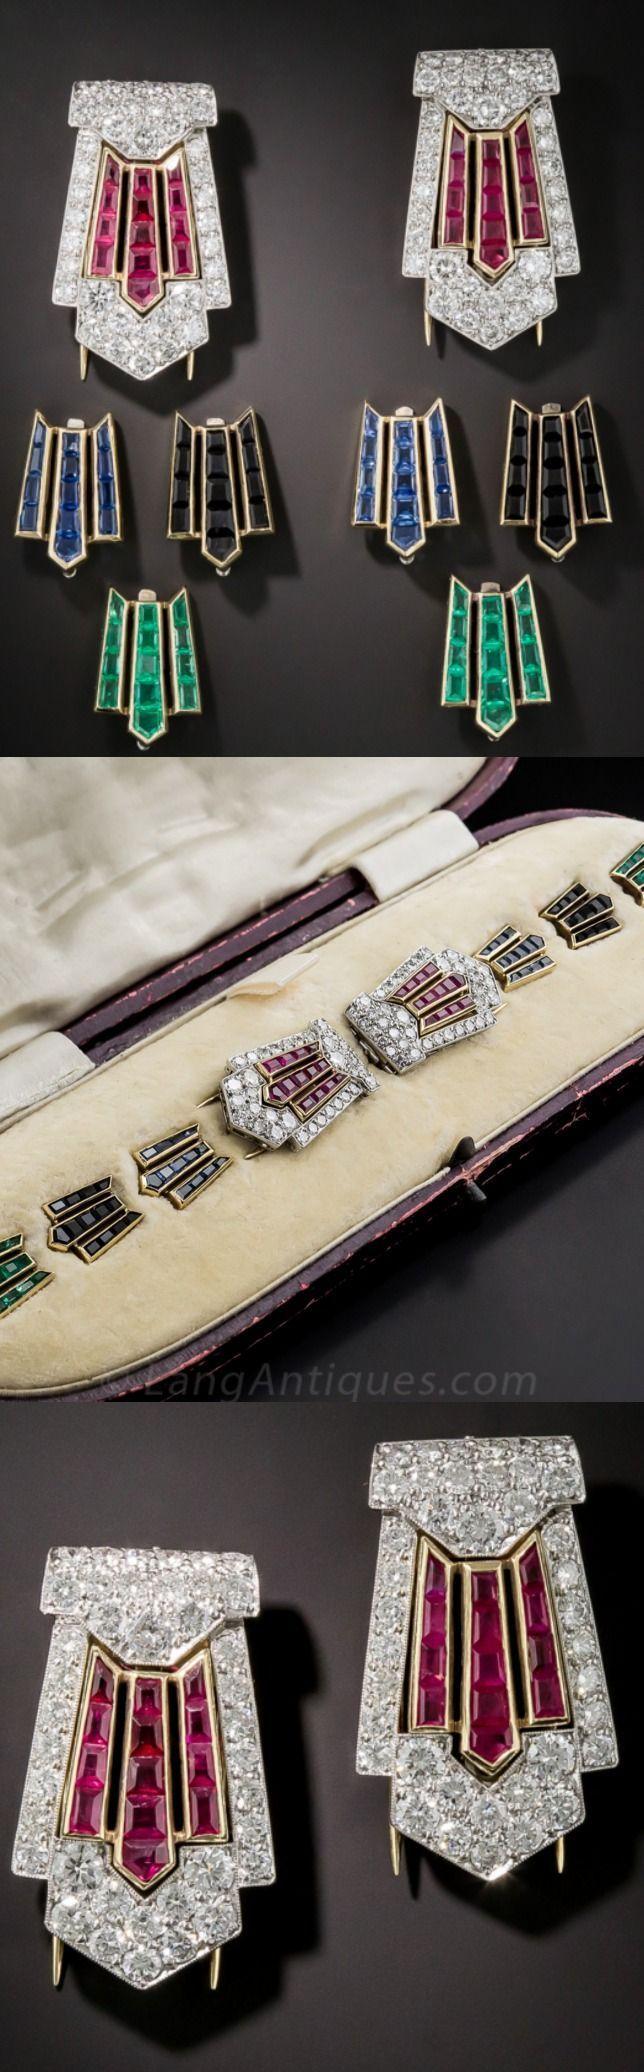 best fine jewelry images on pinterest jewerly fine jewelry